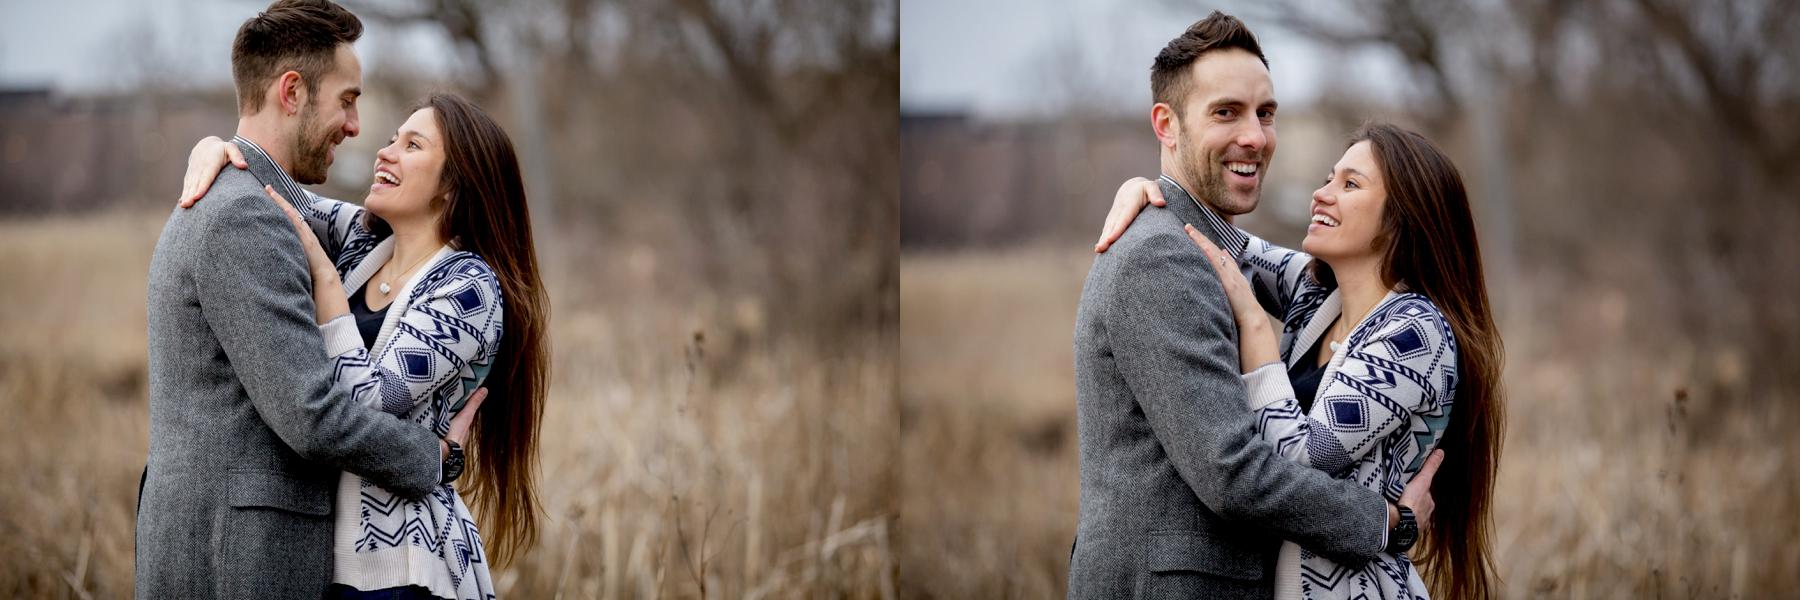 Brandon_Shafer_Photography_Kim_Nick_Engagement_0016.jpg